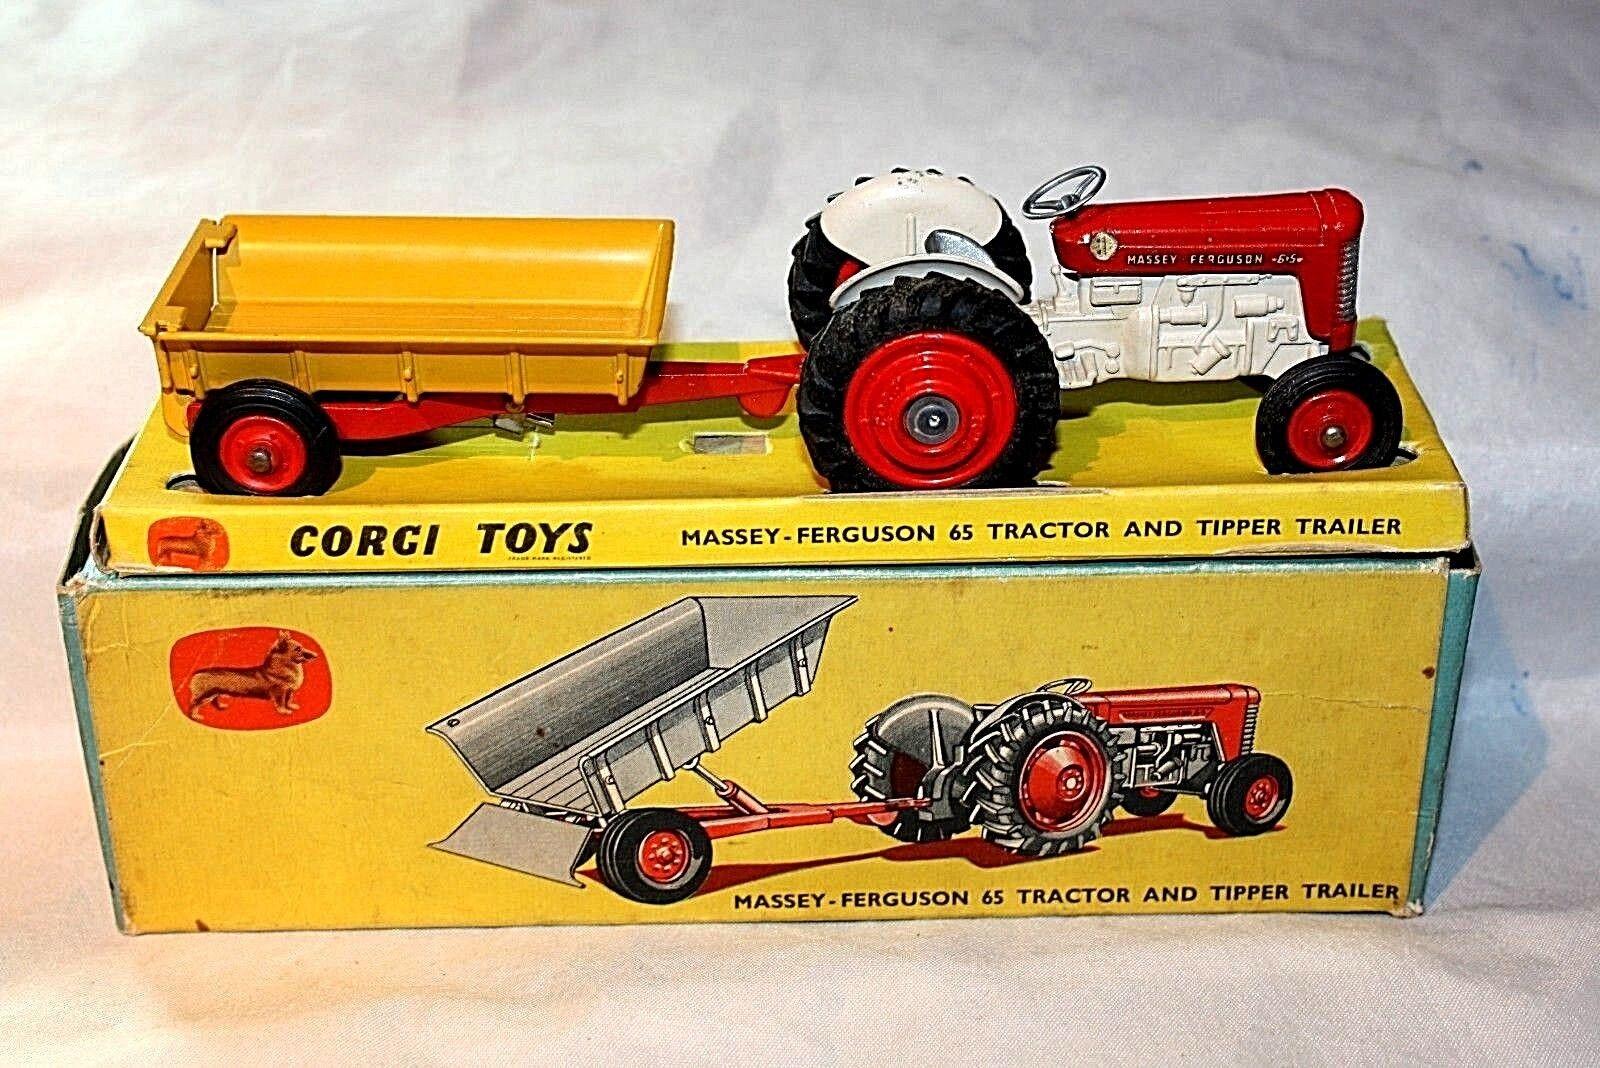 Corgi GS7 Massey-Ferguson 65 Tractor and Trailer, Great Condition, Original Box